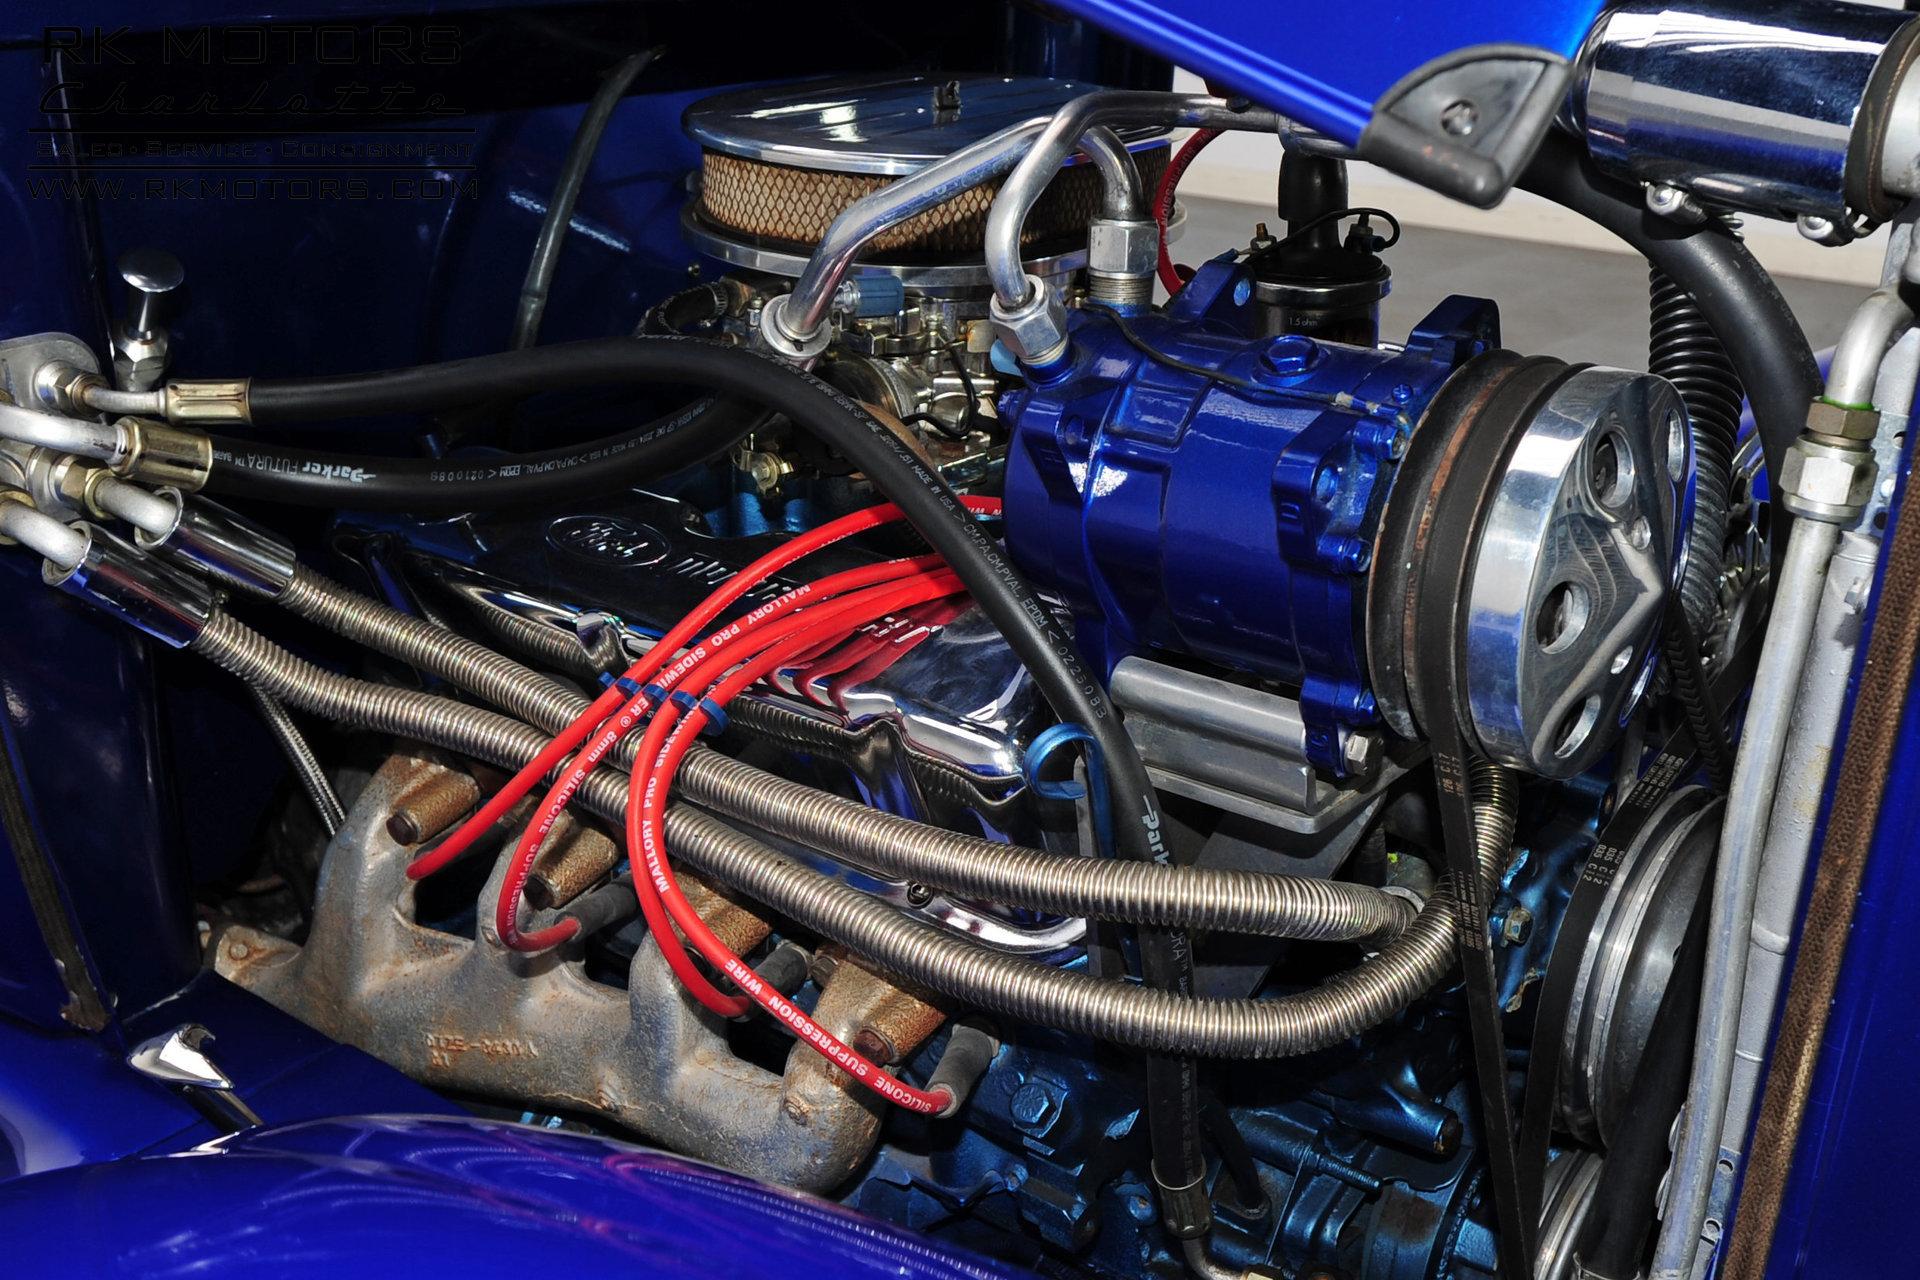 132824 1930 Ford Sedan Rk Motors Classic Cars For Sale Model Electrical Wiring